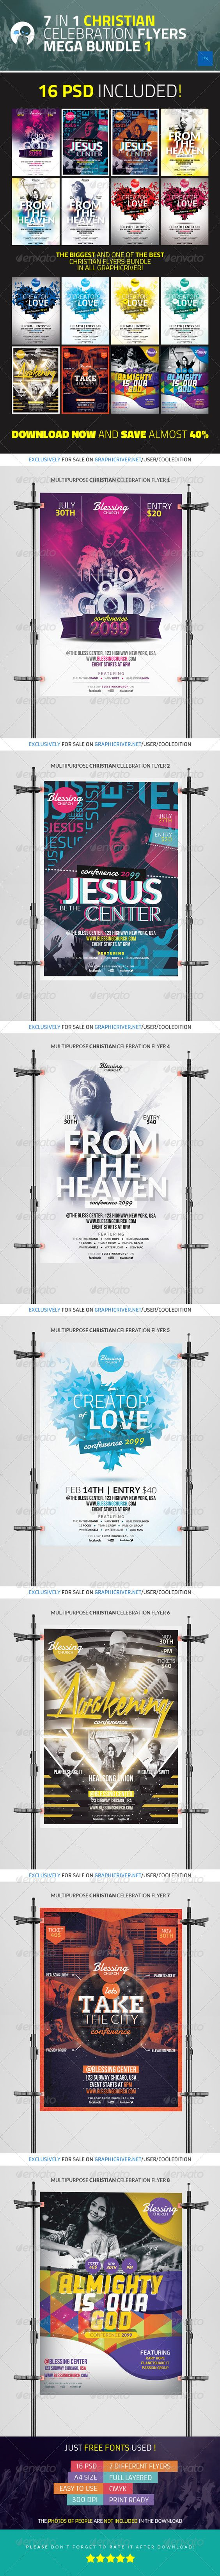 in christian celebration flyers mega bundle logos church 7 in 1 christian celebration flyers mega bundle 1 photoshop psd biggest pro